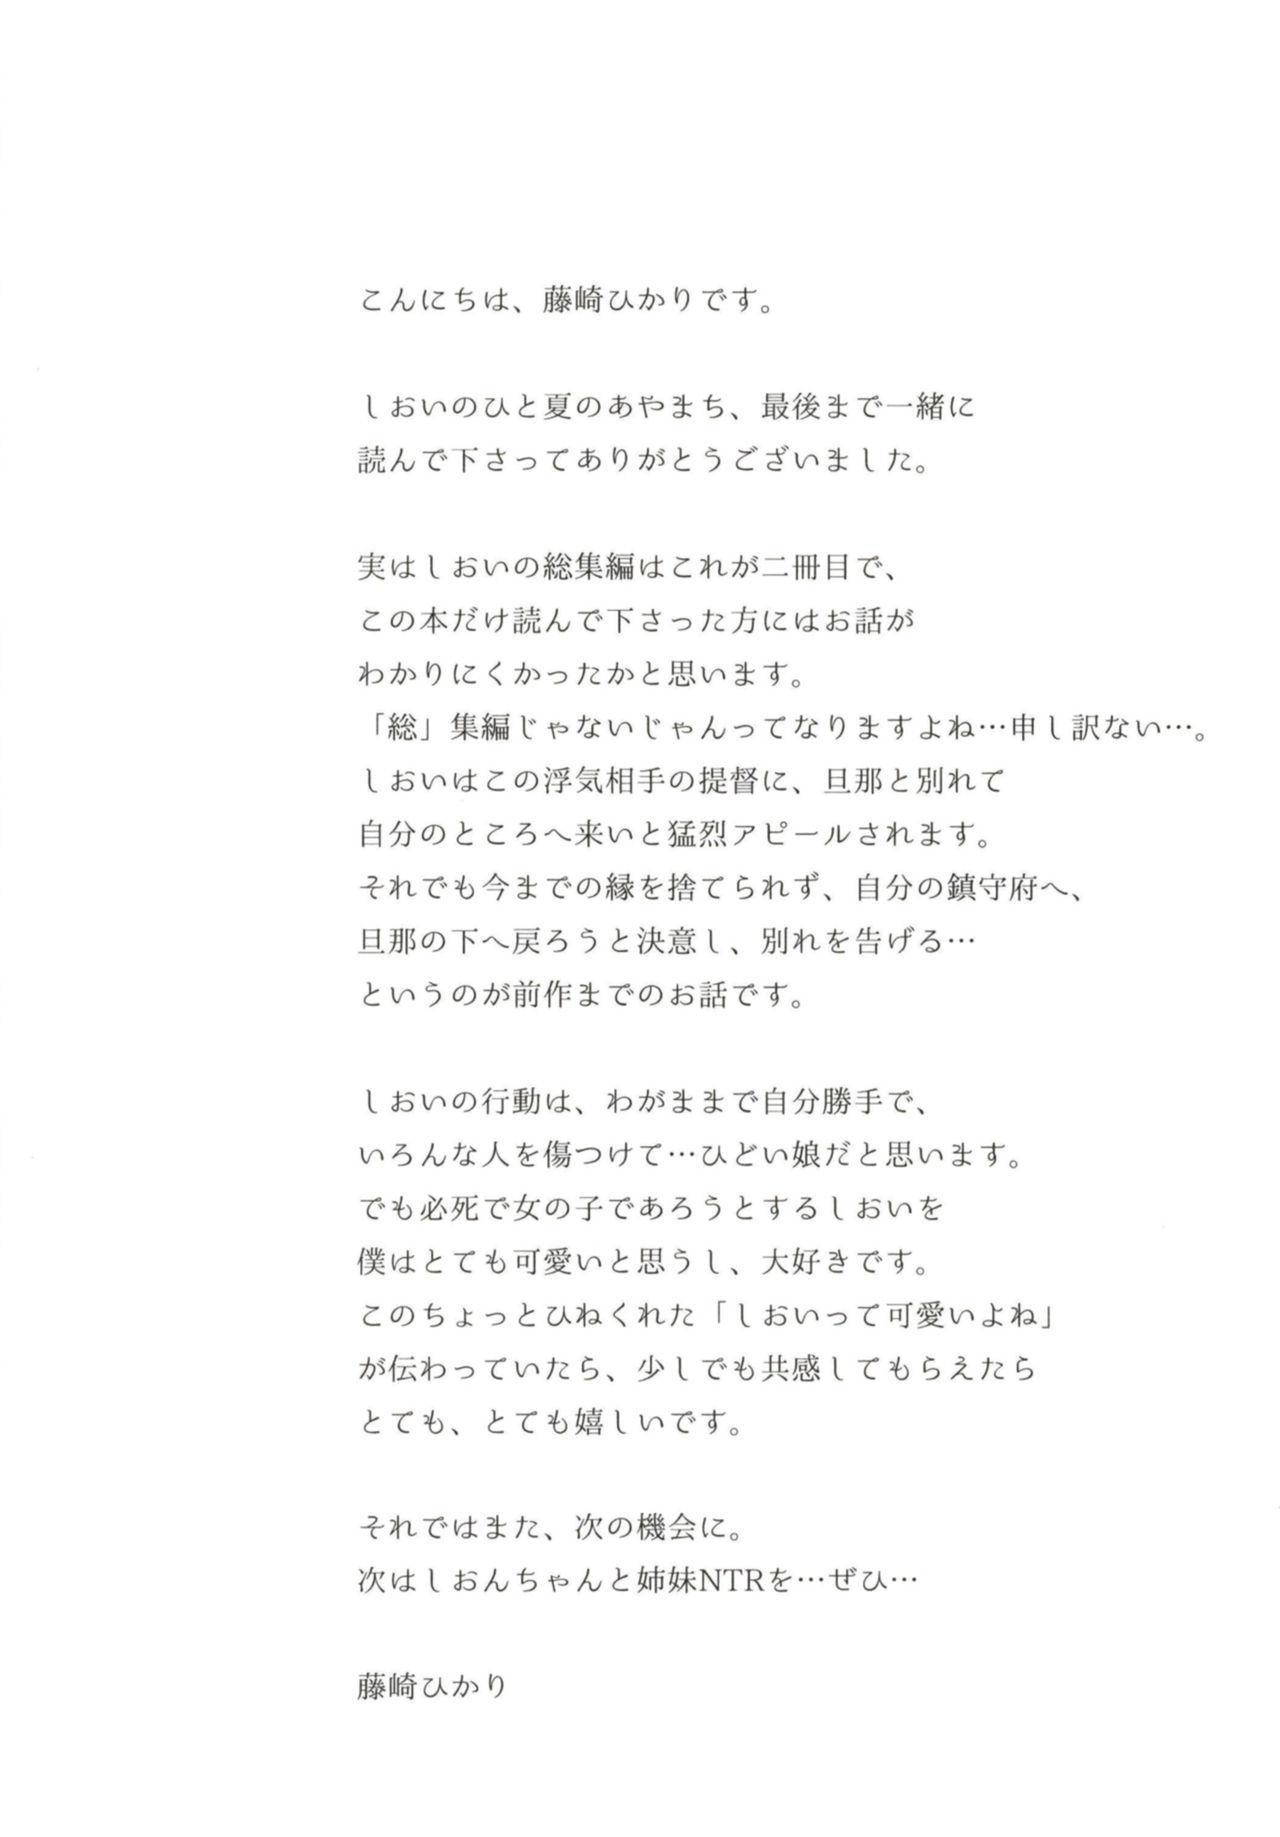 [French letter (Fujisaki Hikari)] Hitonatsu no Ayamachi -I-401 Soushuuhen- (Kantai Collection -KanColle-) [Digital] 87